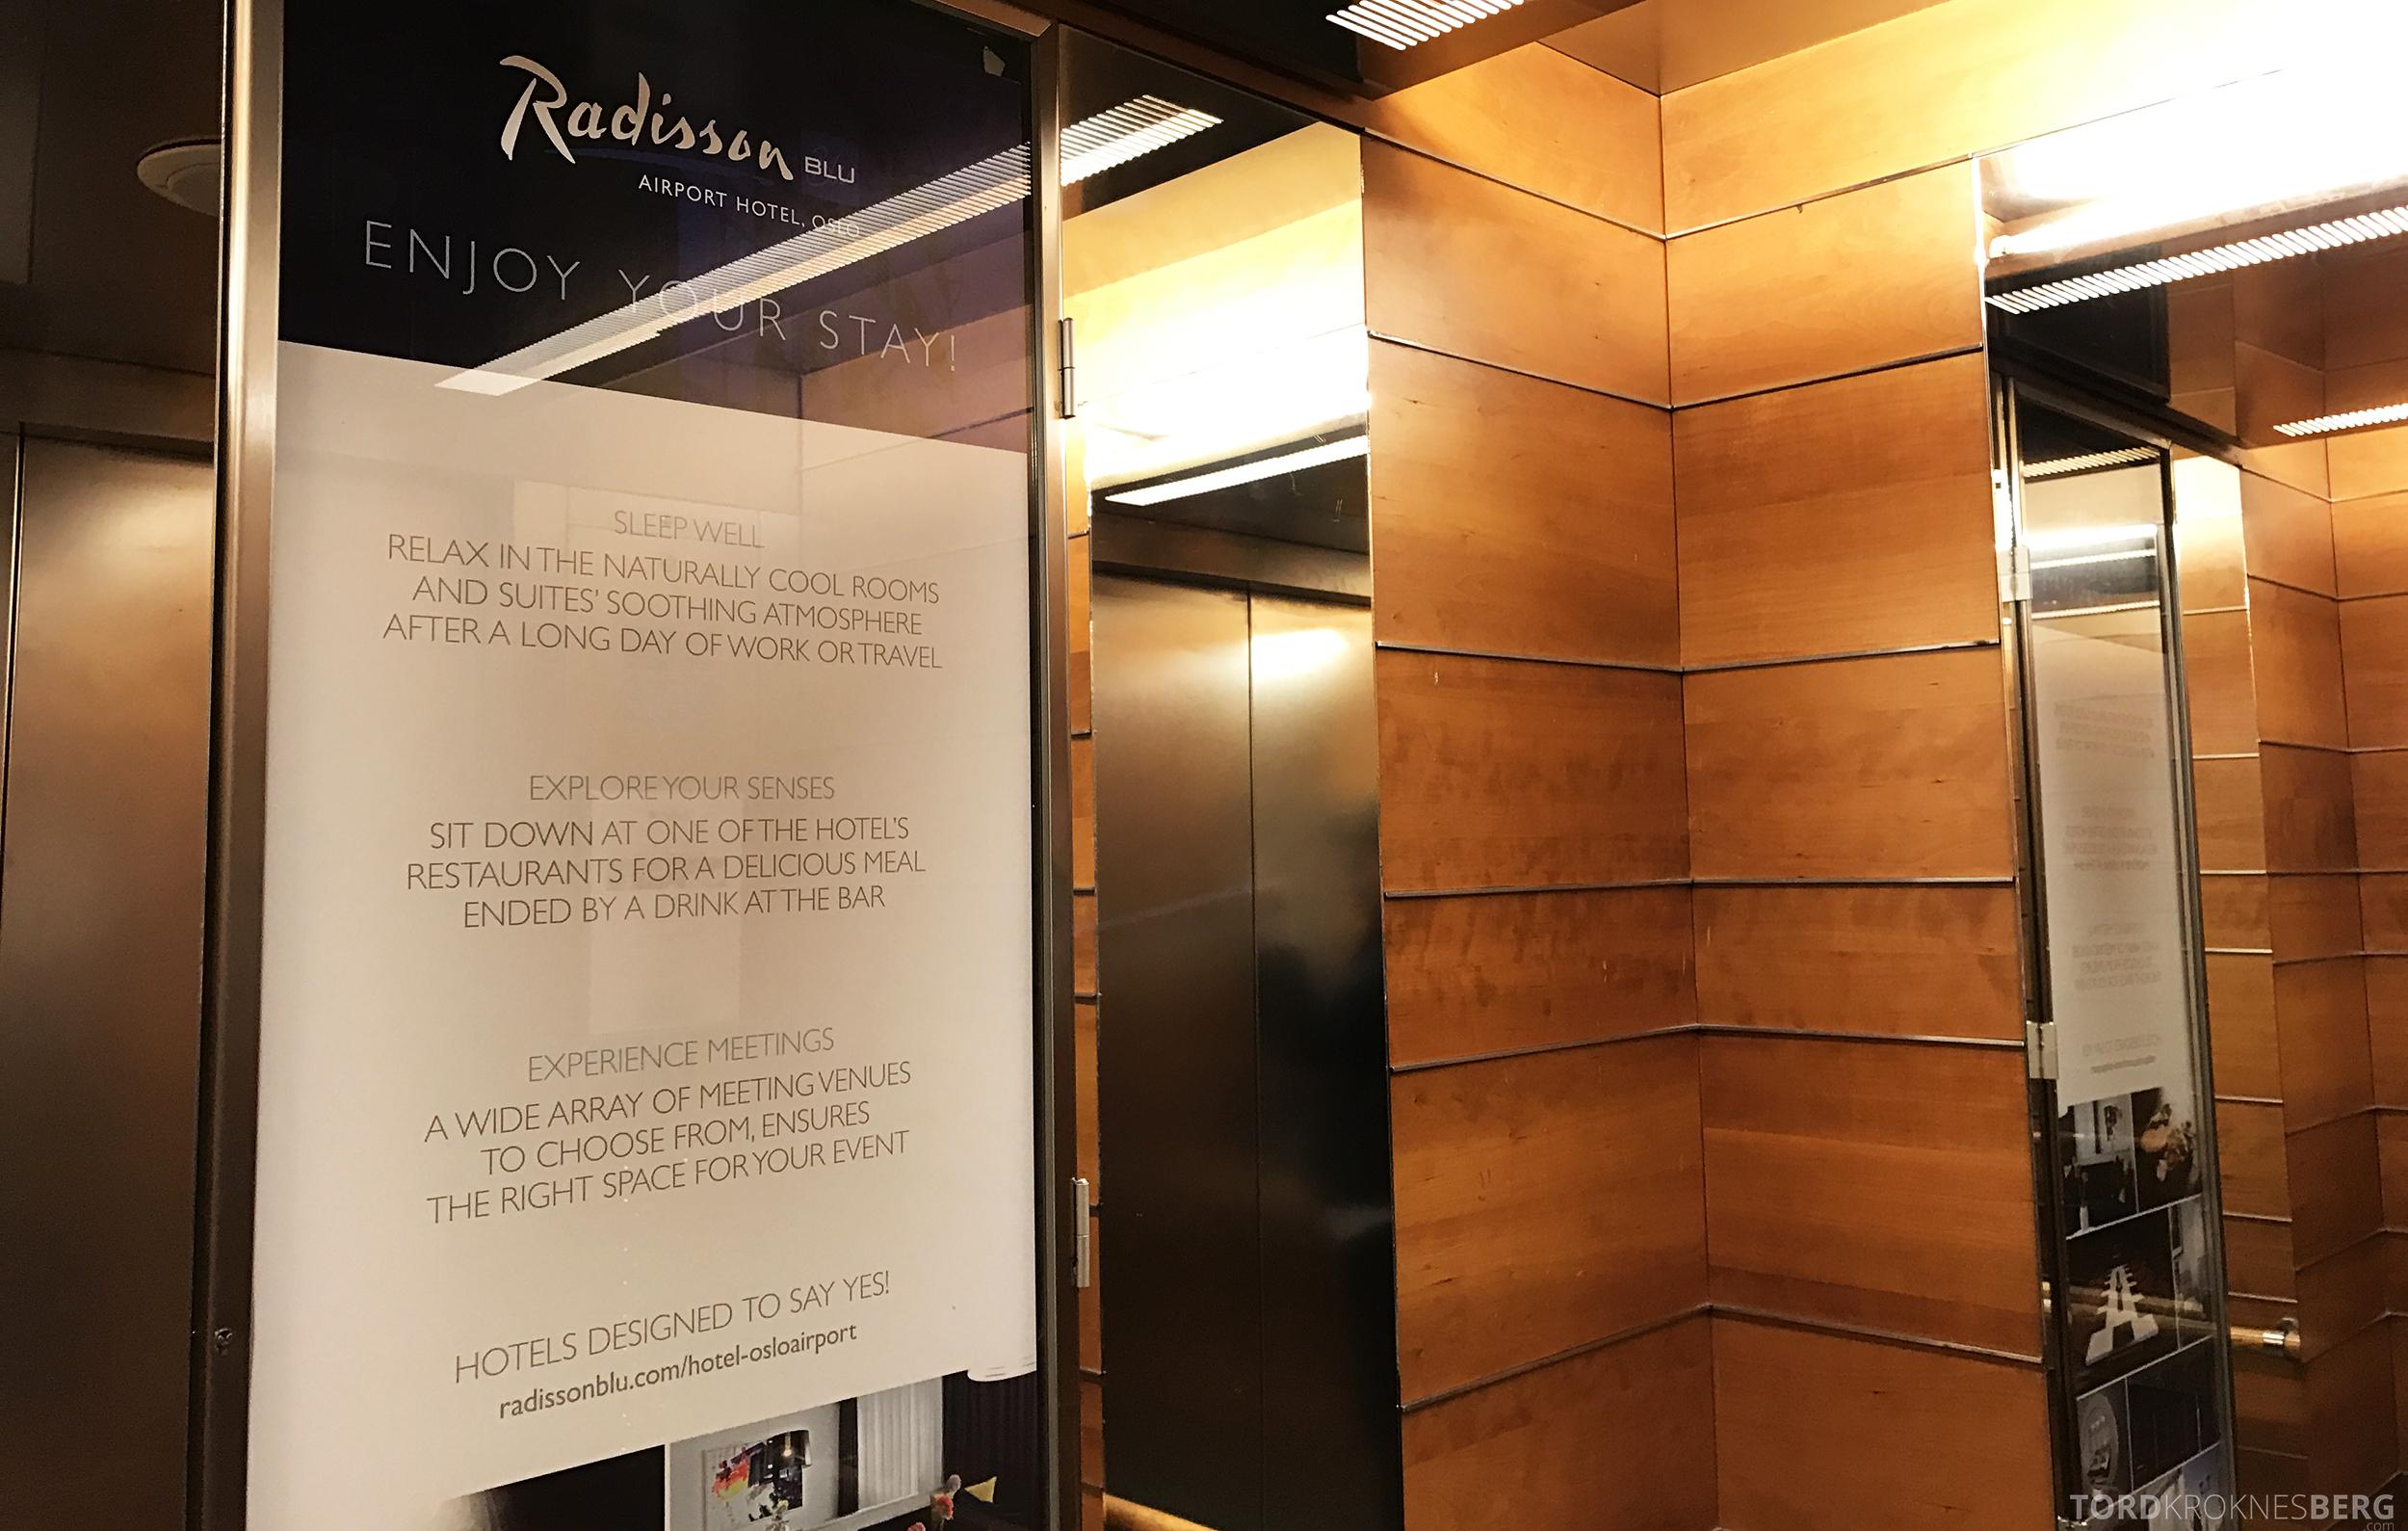 Radisson Blu Oslo Airport Hotel suite heis